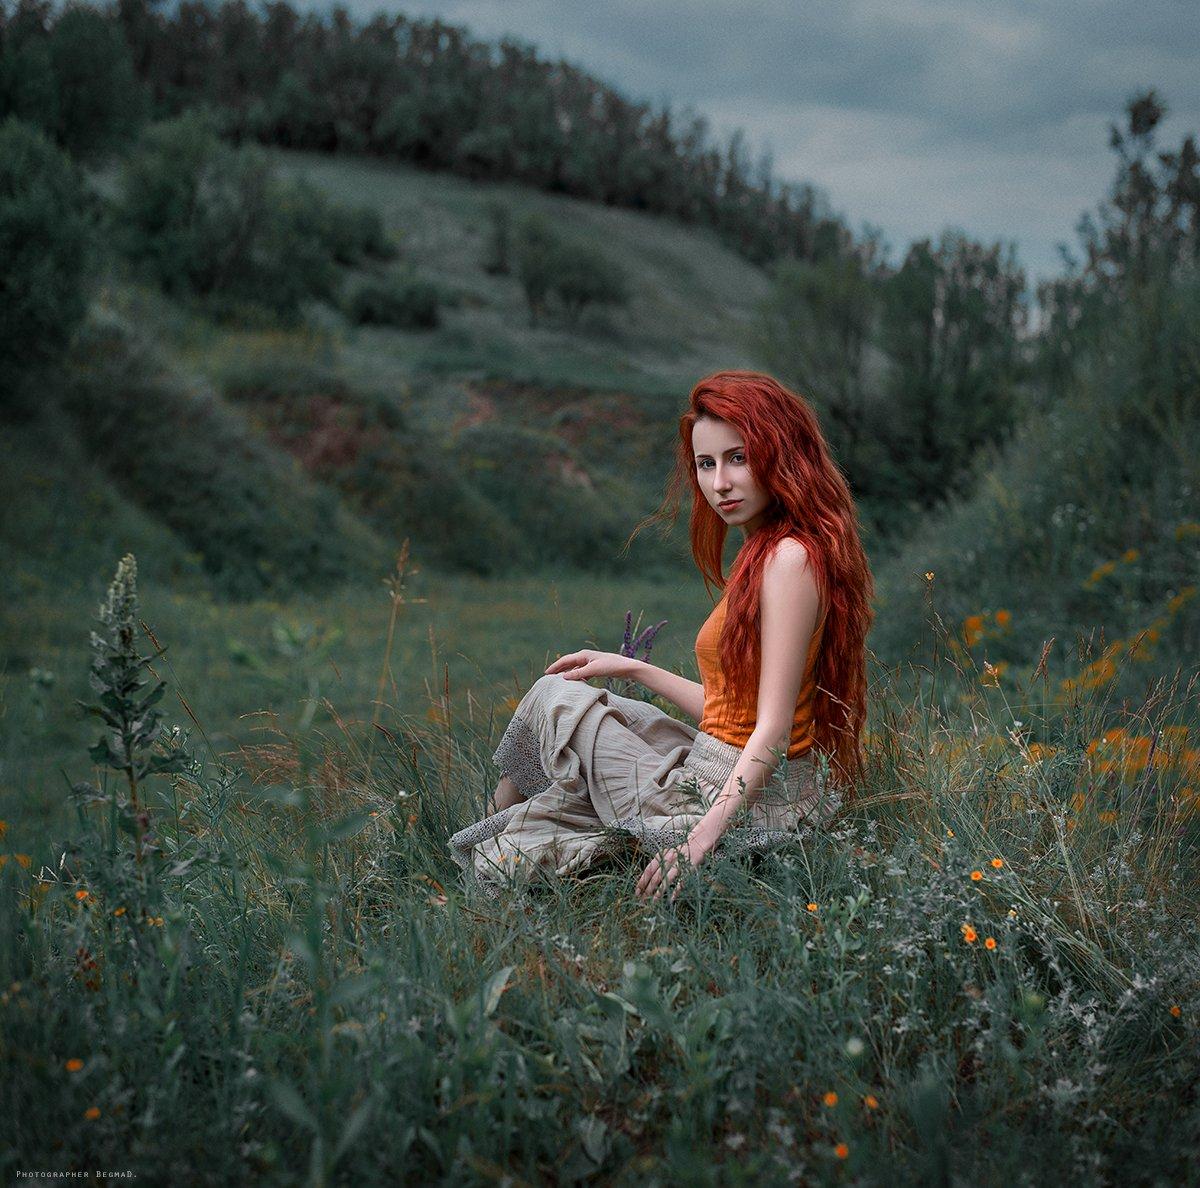 art photo, beautiful, begmad, dantar90, eyes, girl, model, nikon, portrait, pretty, red, ukraine, красивая, портрет девушки, рыжая, фотоарт, Дмитрий Бегма